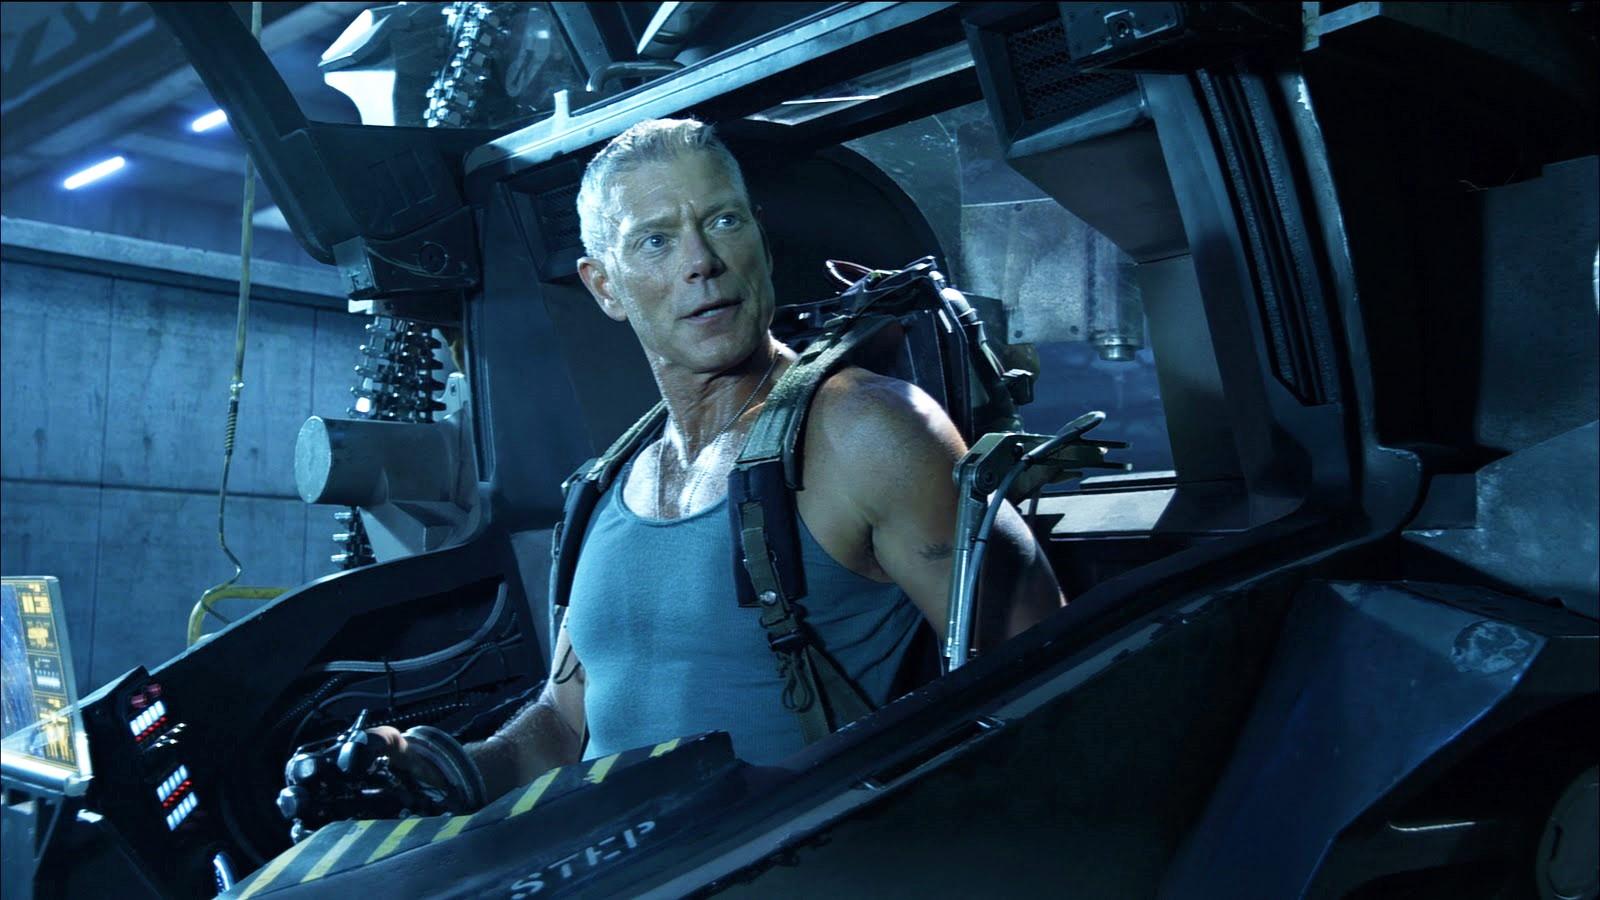 Стивен Лэнг уверен, что «Аватар 2» побьет рекорд «Мстителей: Финал»